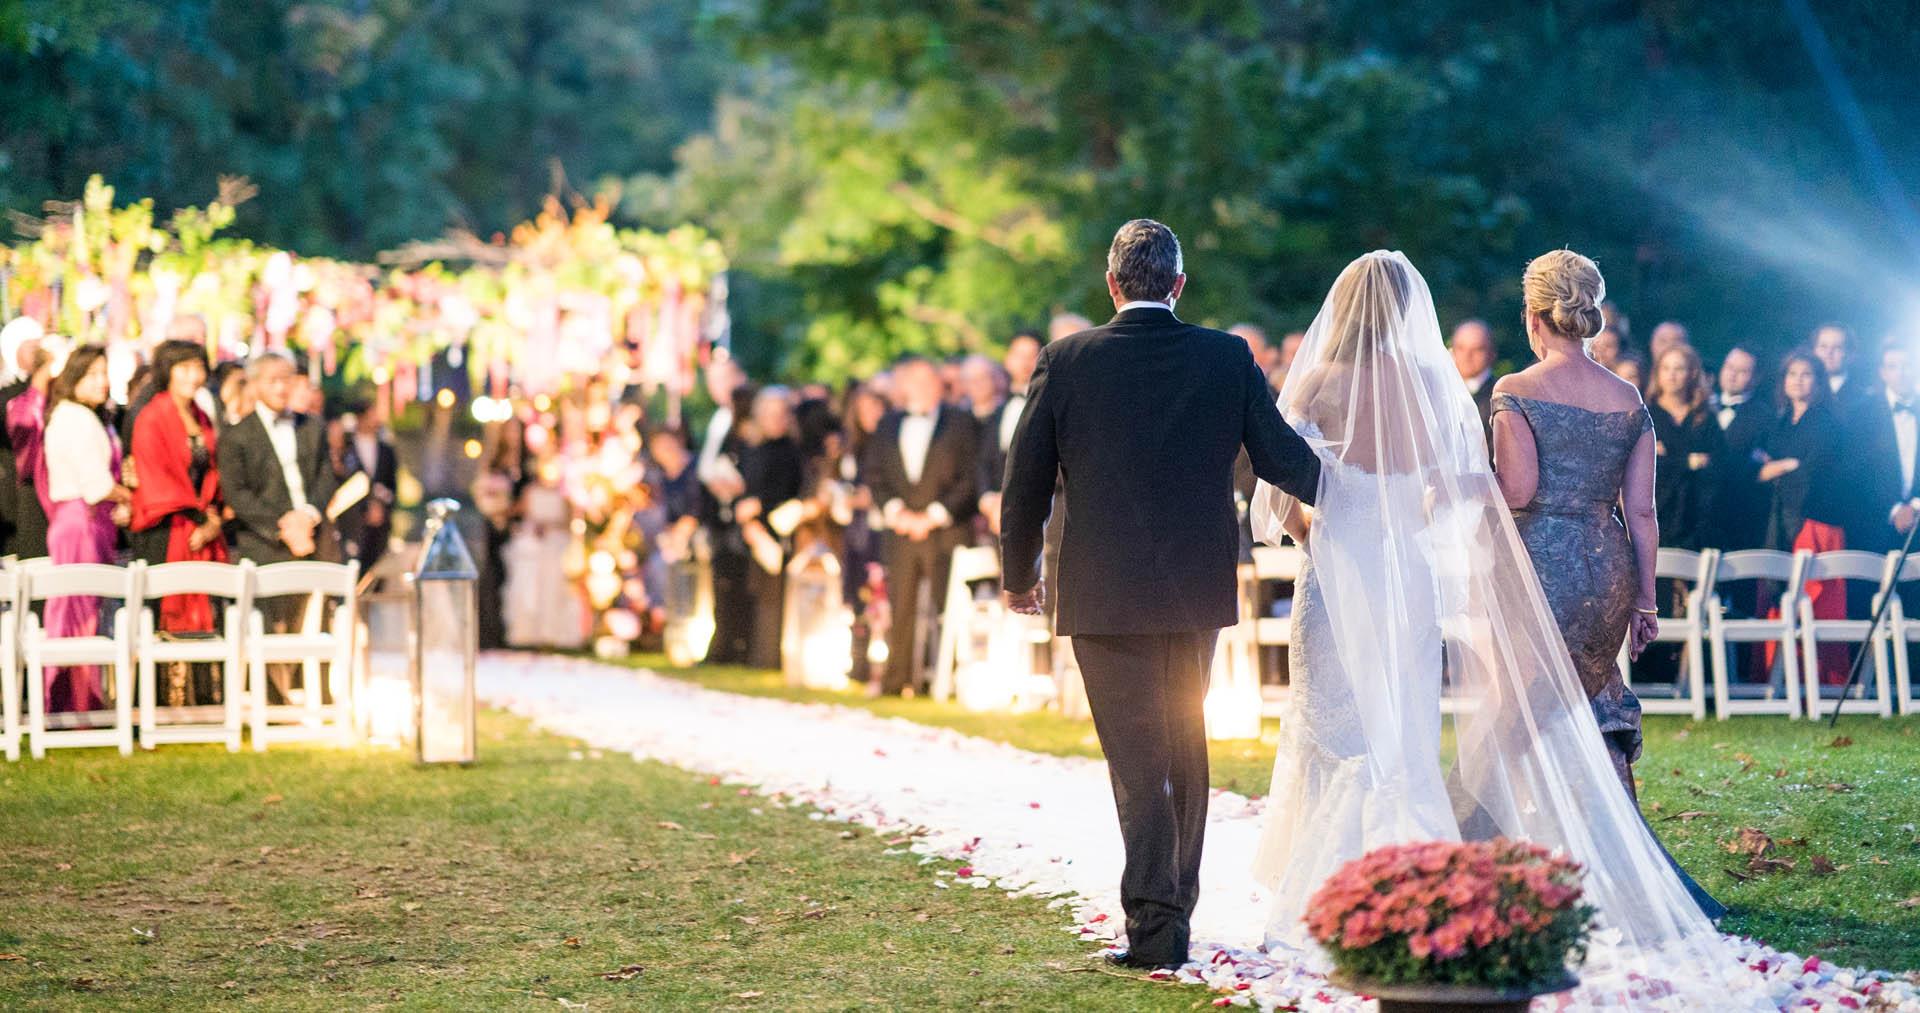 Wedding Ceremony Atheist Wedding Ceremony: Ceremonies & Special Events Venue NJ